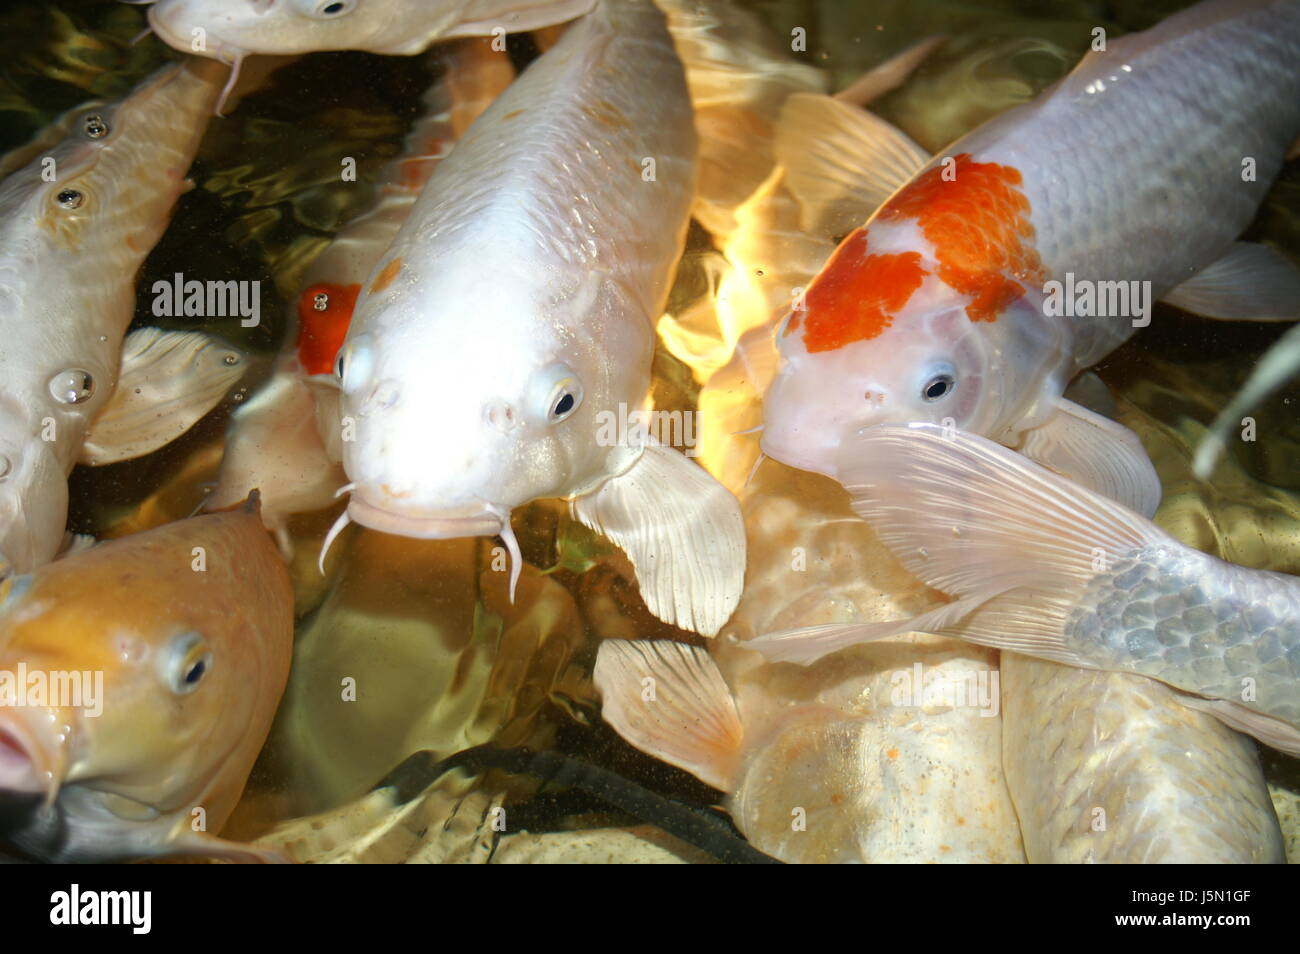 Aquarium Fish Silver Hovel Fresh Water Pond Water Japan Carp Emperor